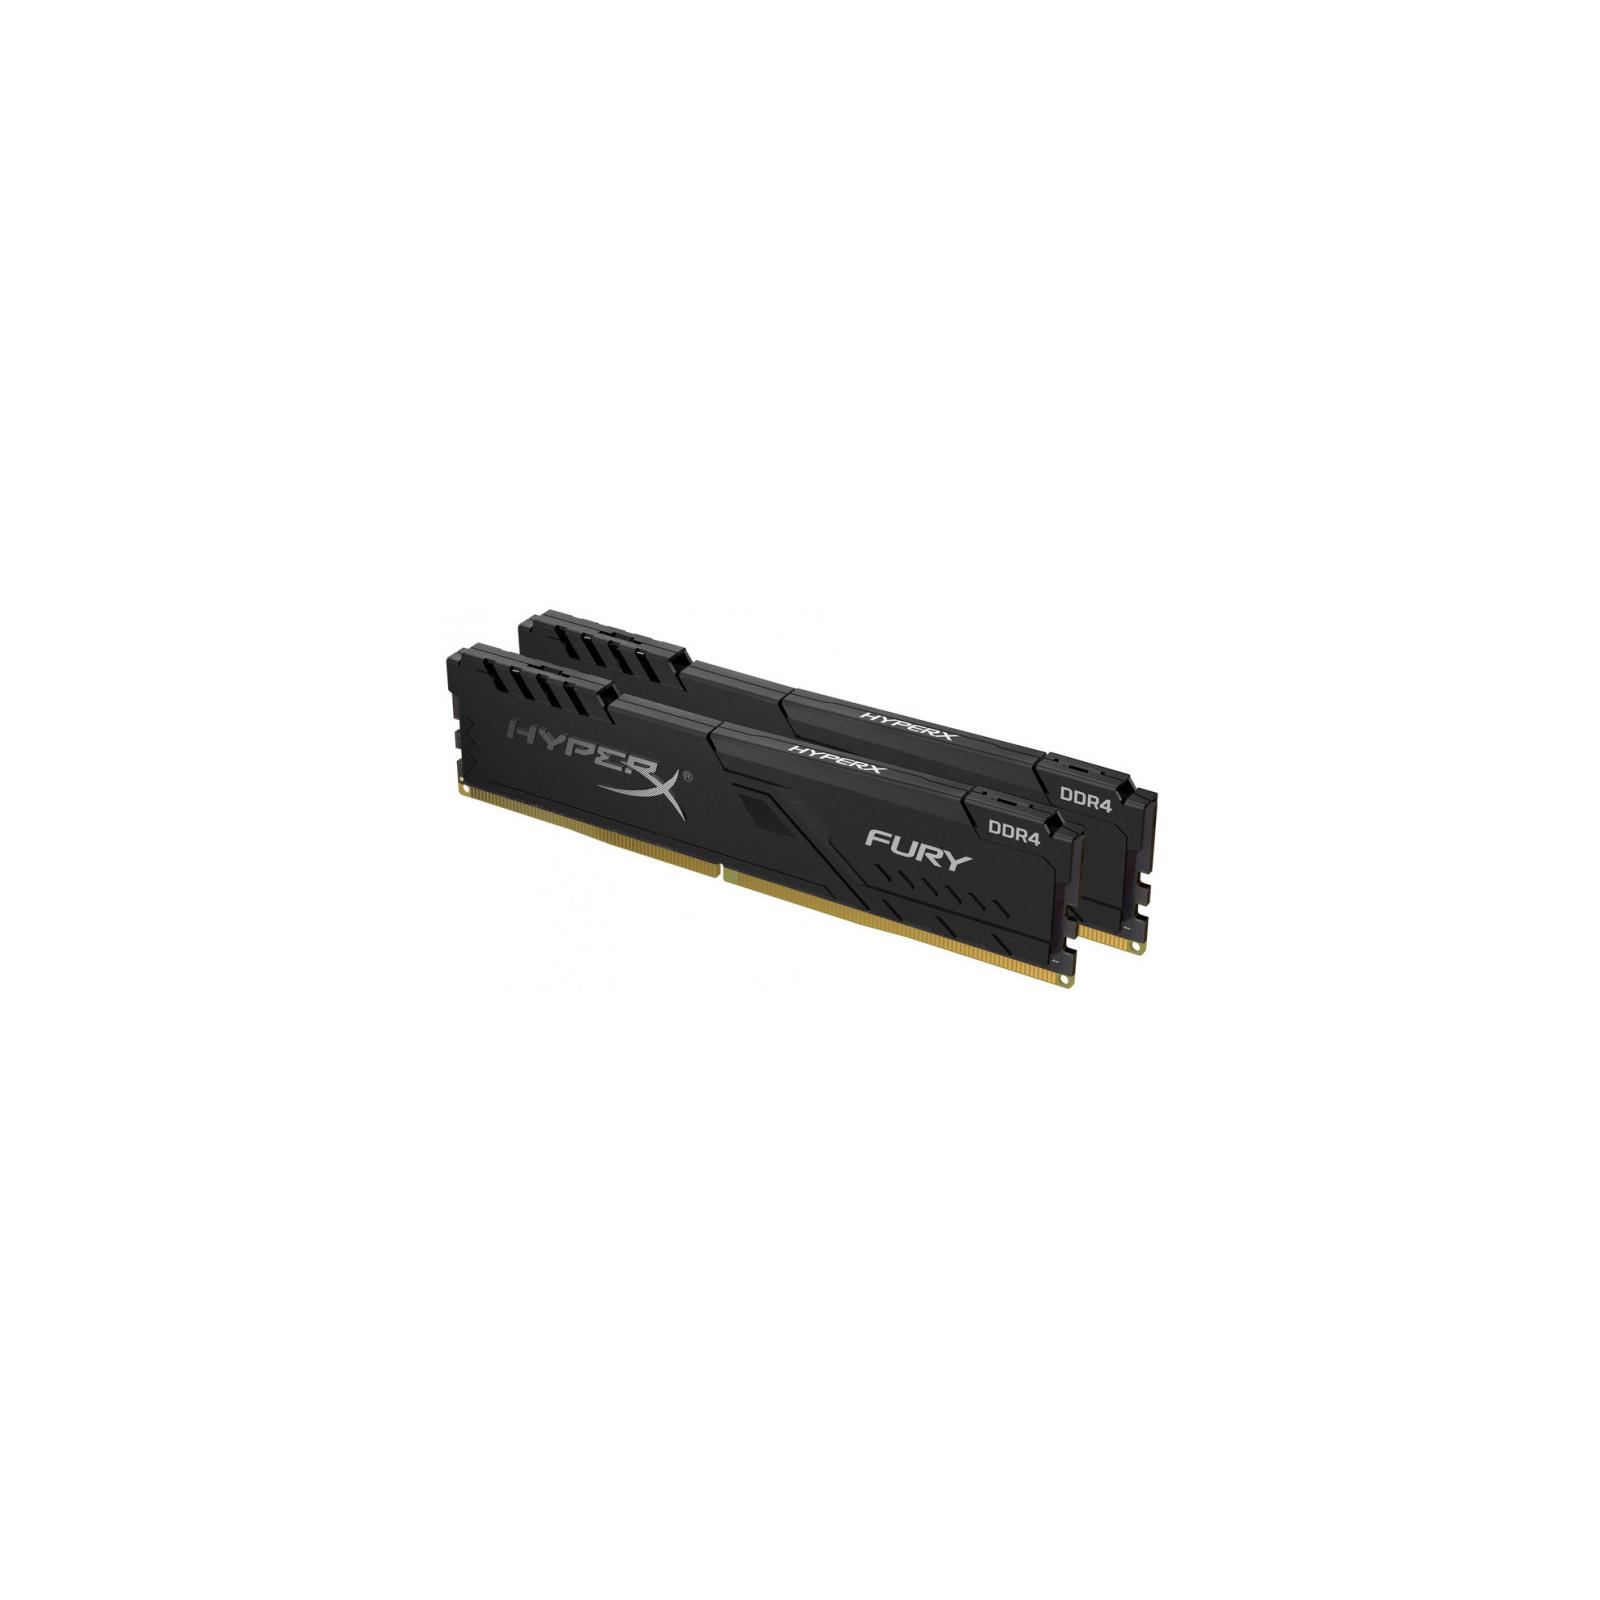 Модуль памяти для компьютера DDR4 8GB (2x4GB) 2400 MHz HyperX Fury Black HyperX (Kingston Fury) (HX424C15FB3K2/8)